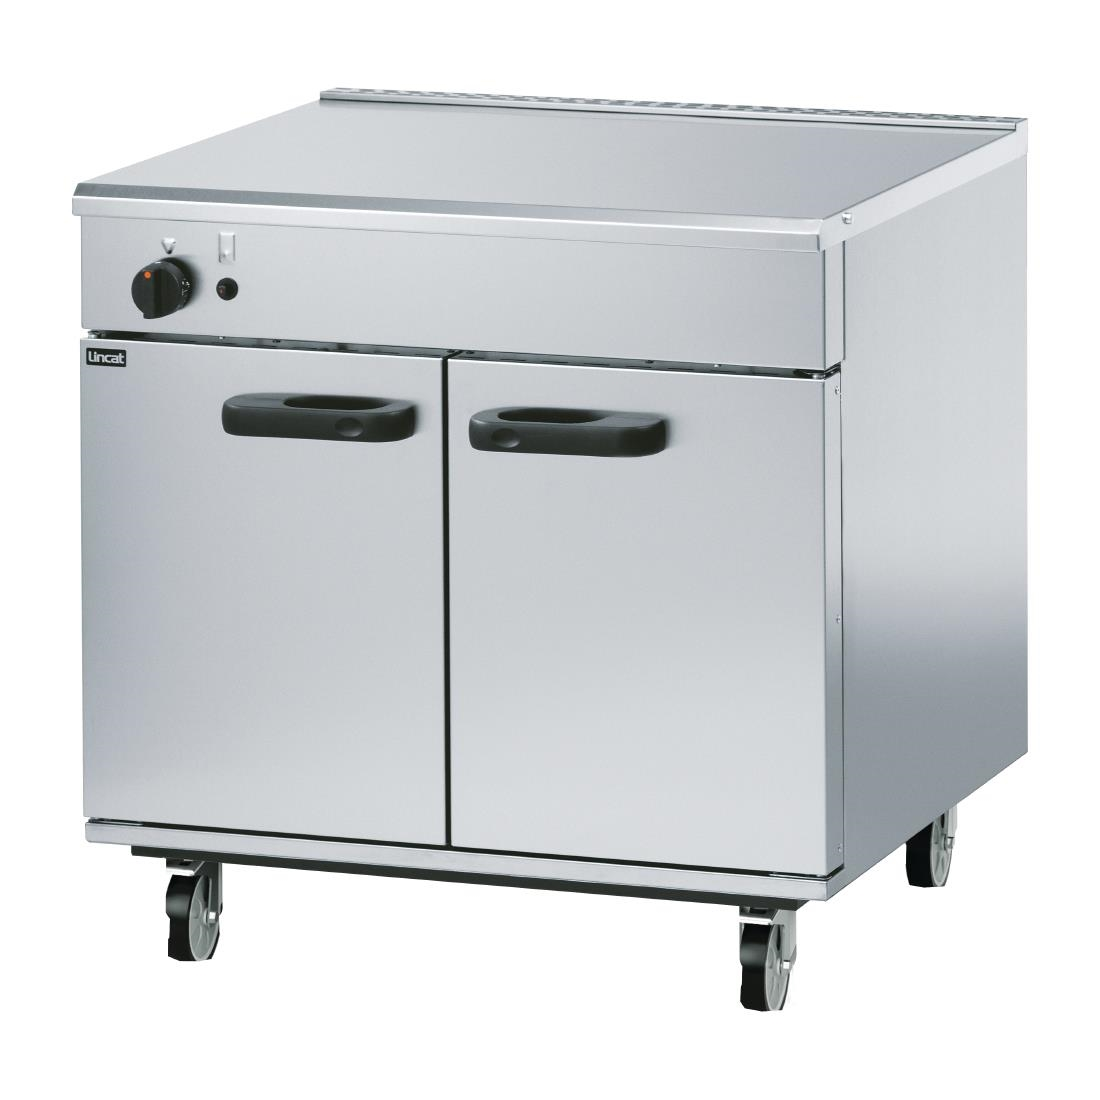 Lincat Phoenix Propane Gas Oven LM09 (GJ578-P)